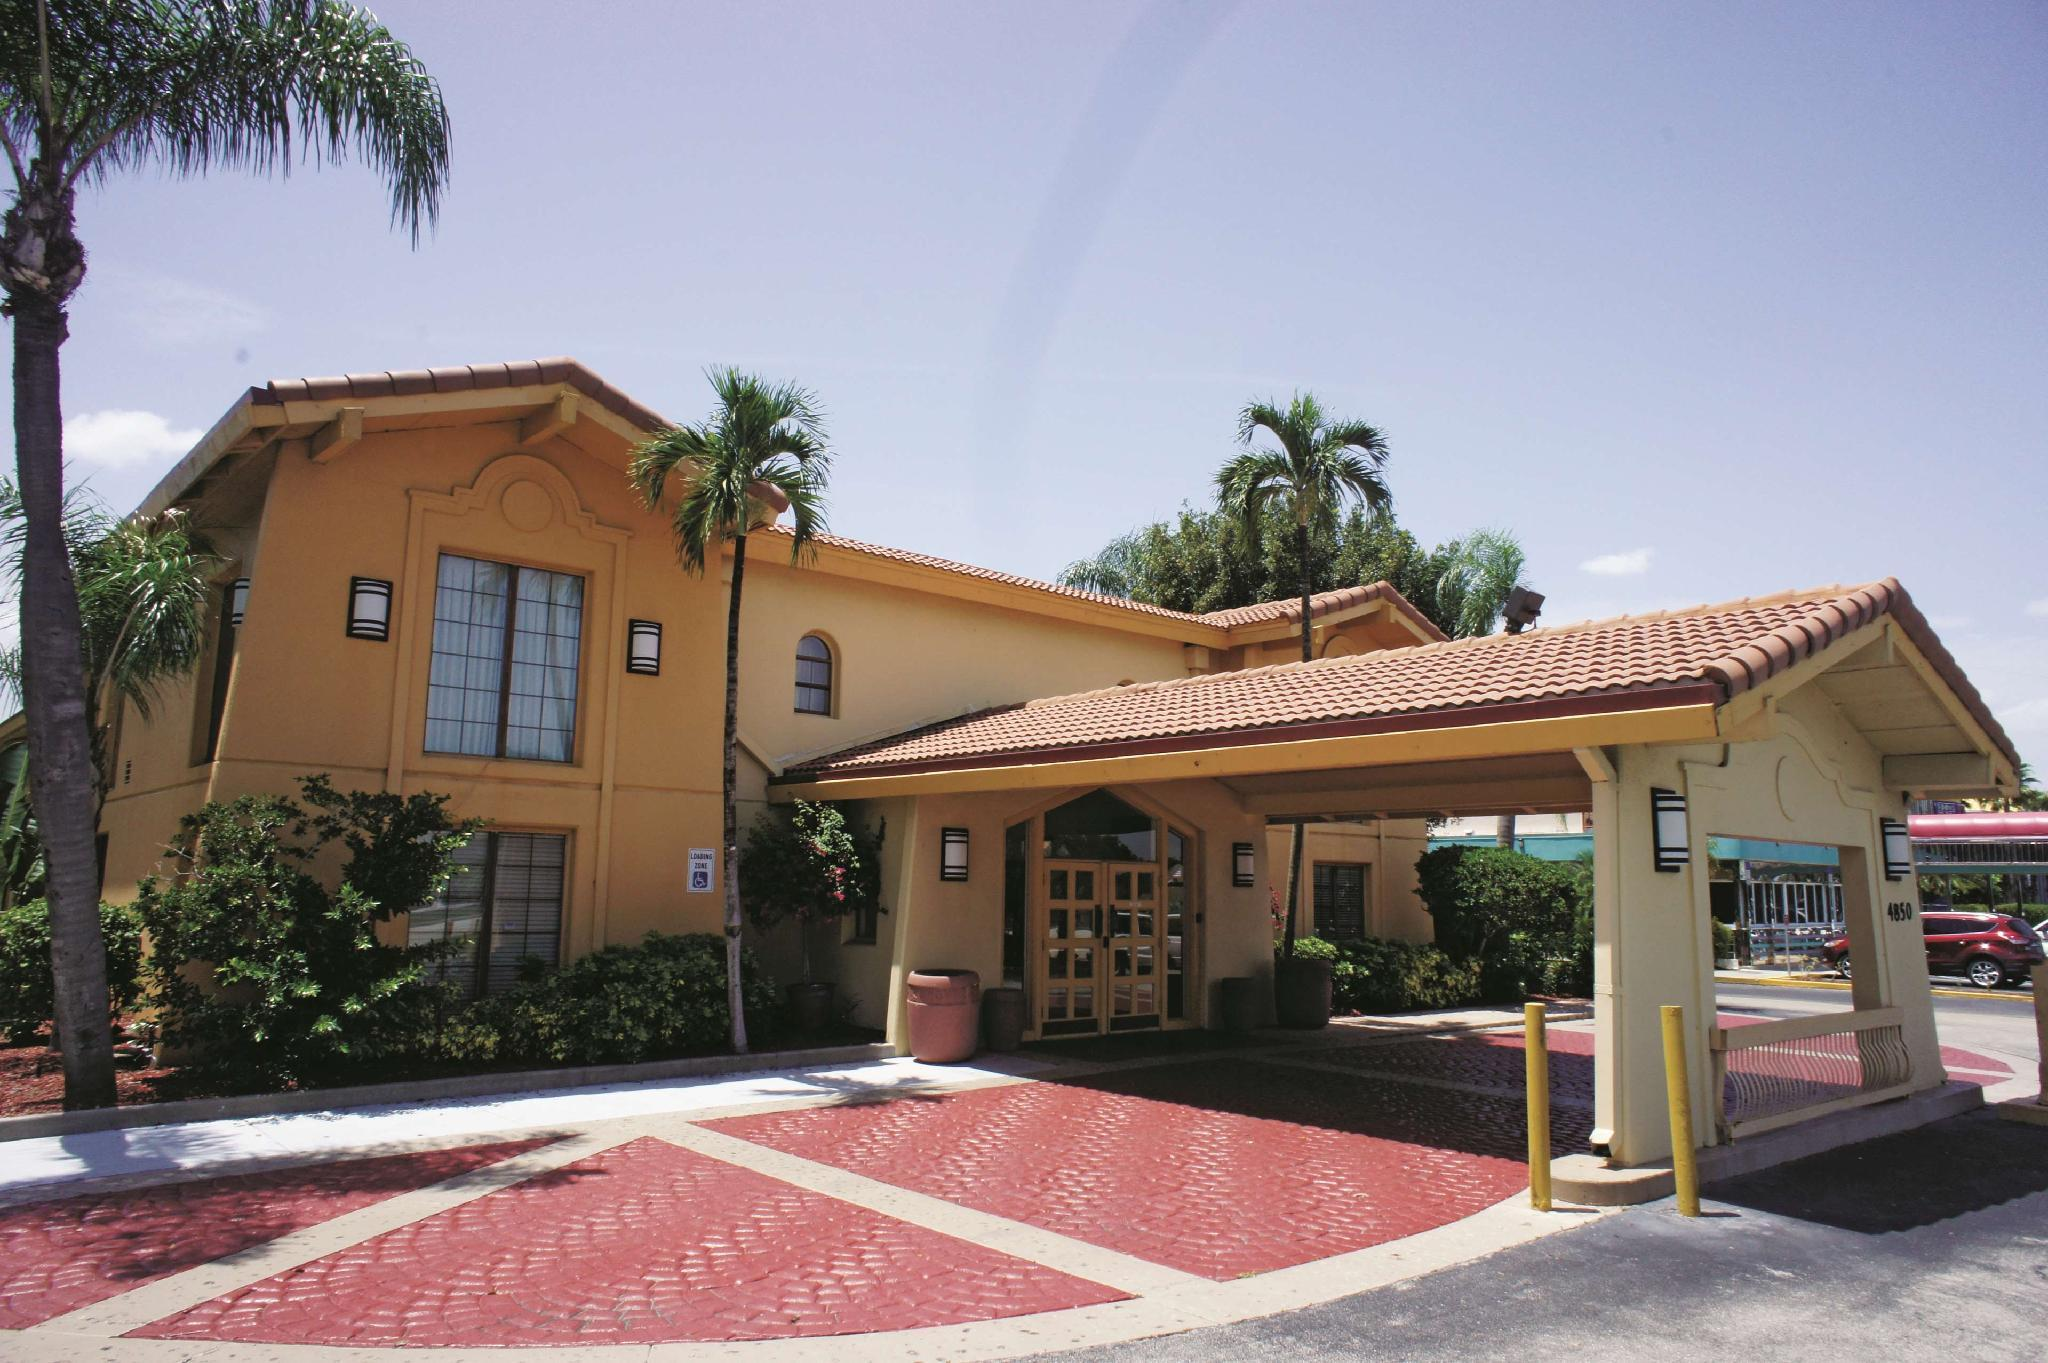 La Quinta Inn By Wyndham Fort Myers Central